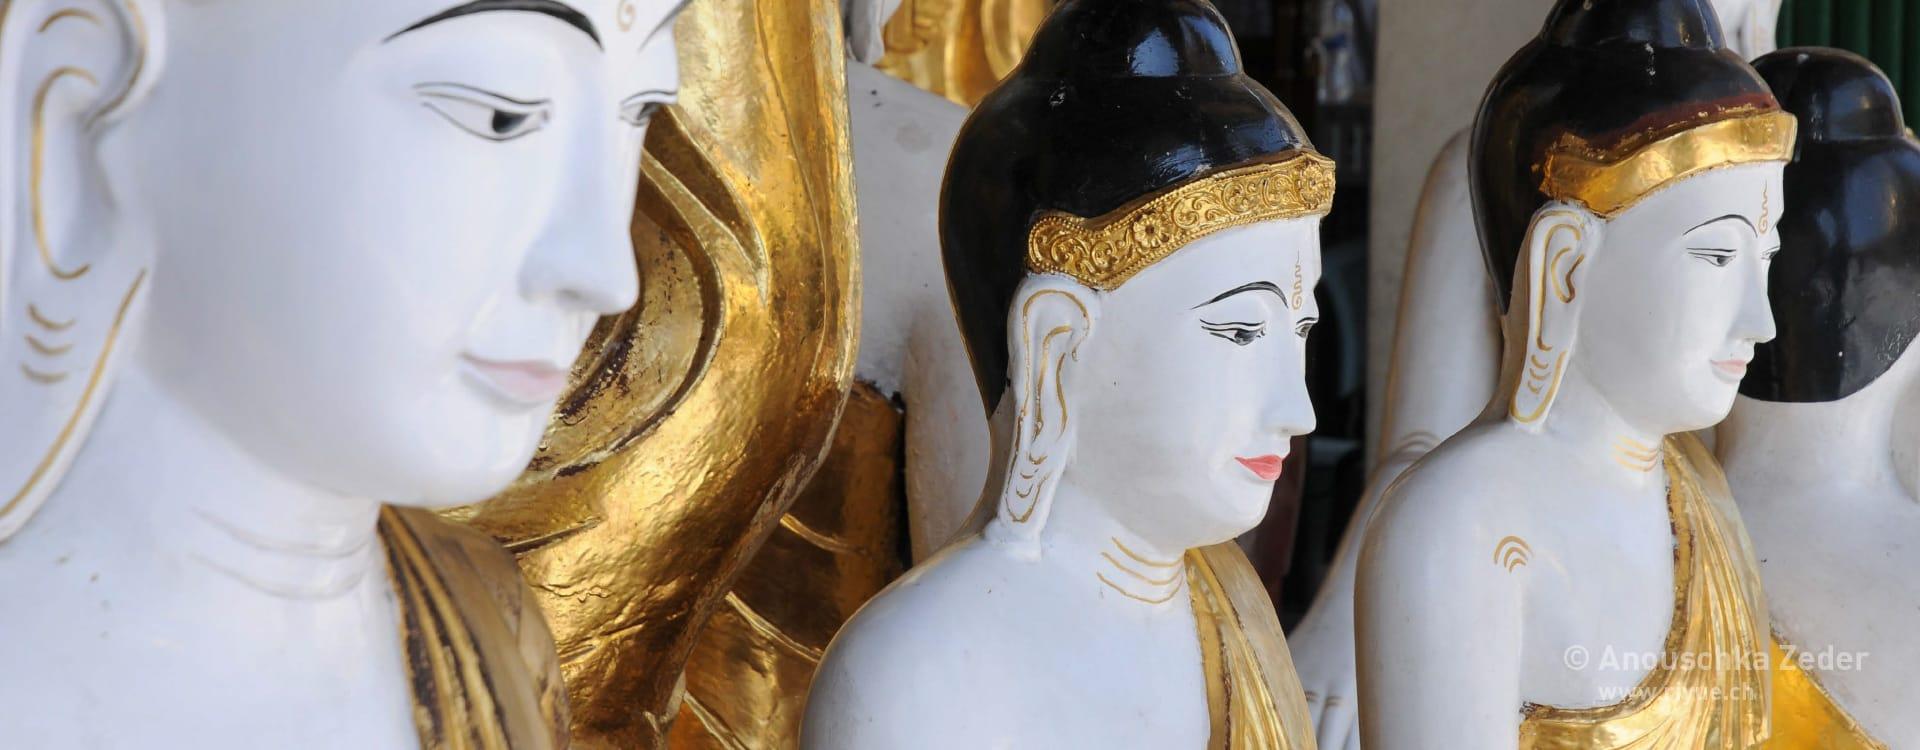 riyue – Akupunktur – Buddhas Myanmar